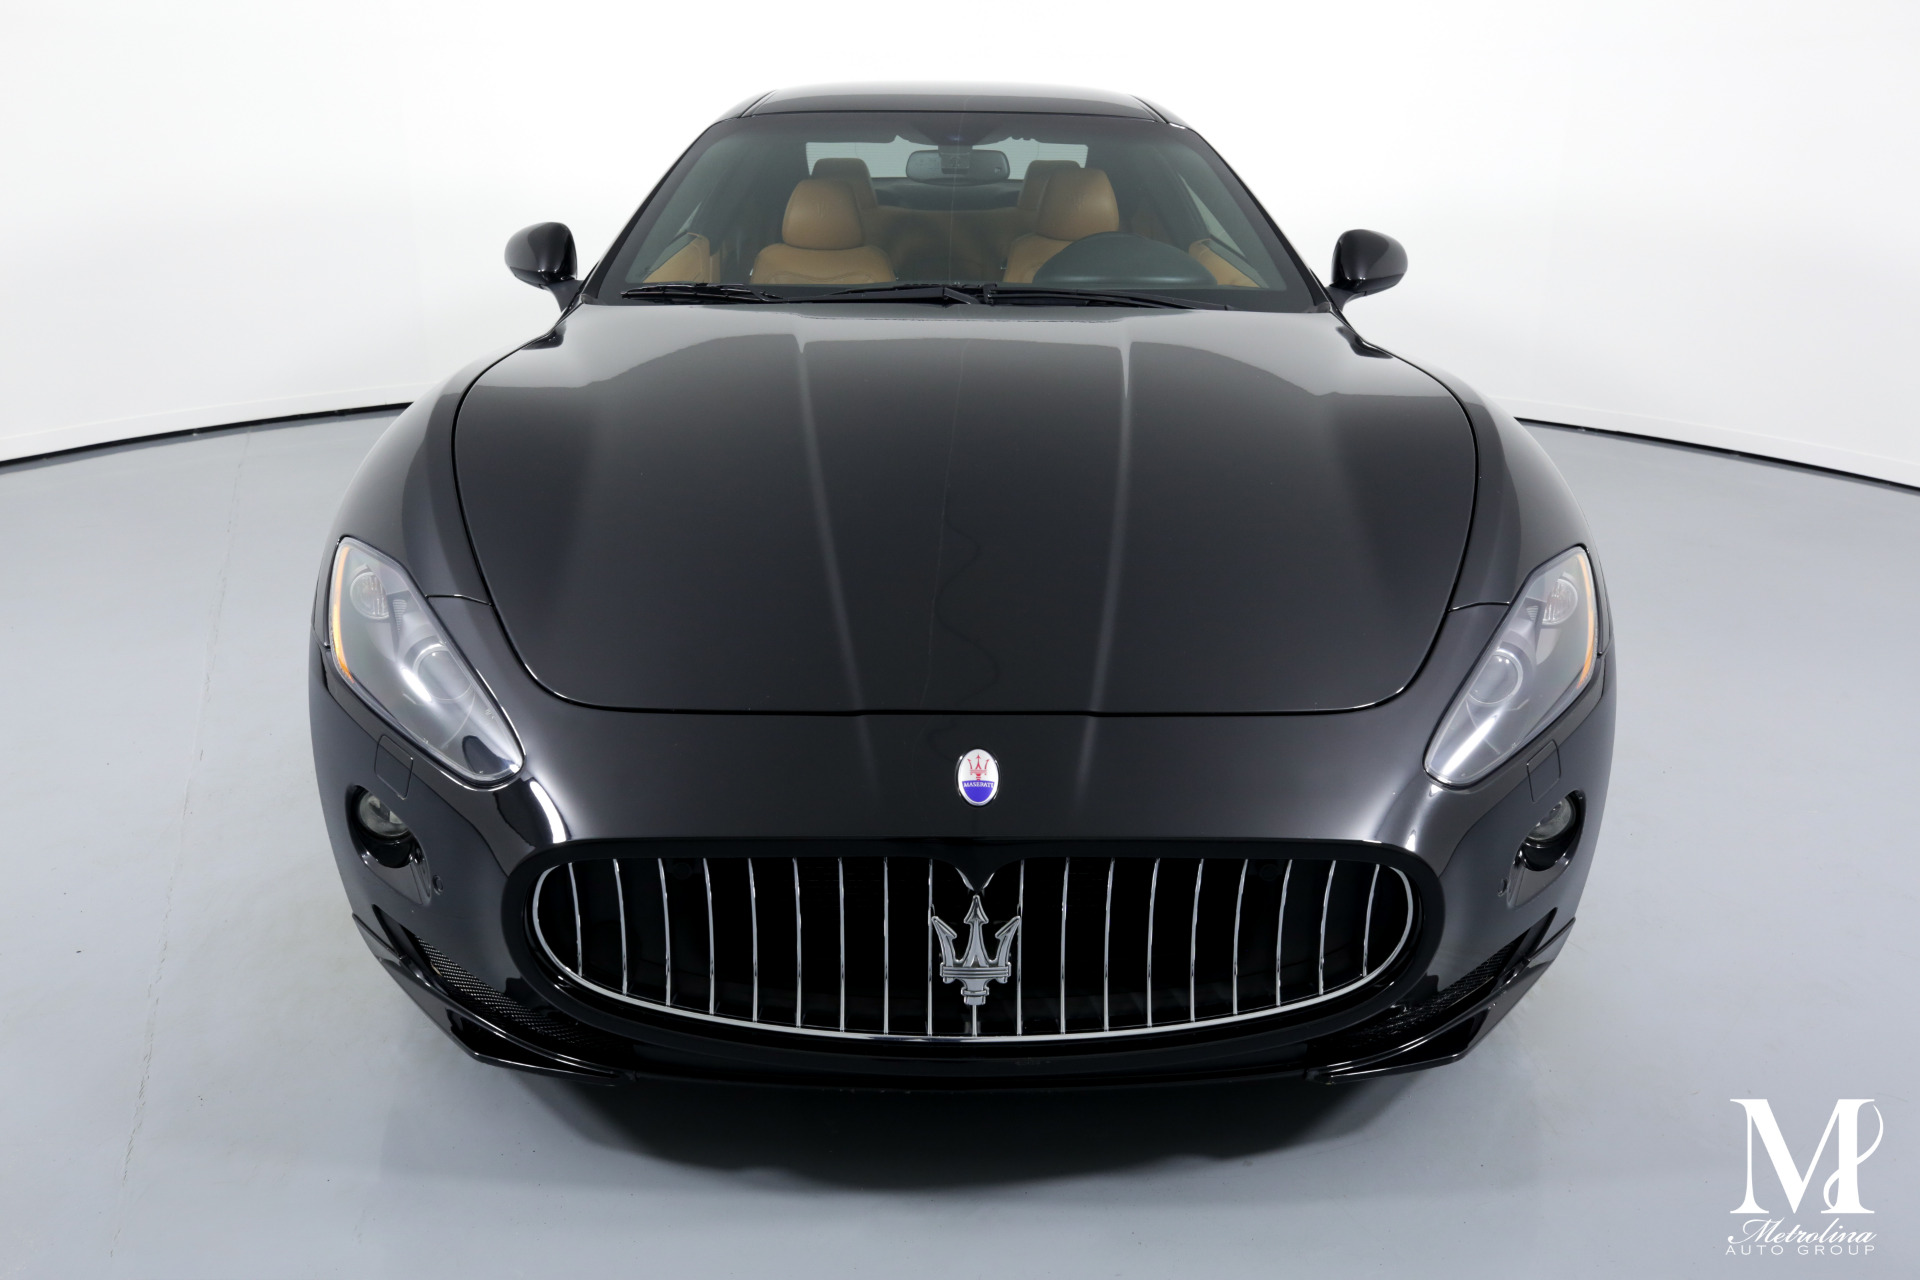 Used 2012 Maserati GranTurismo S Automatic for sale $38,996 at Metrolina Auto Group in Charlotte NC 28217 - 3